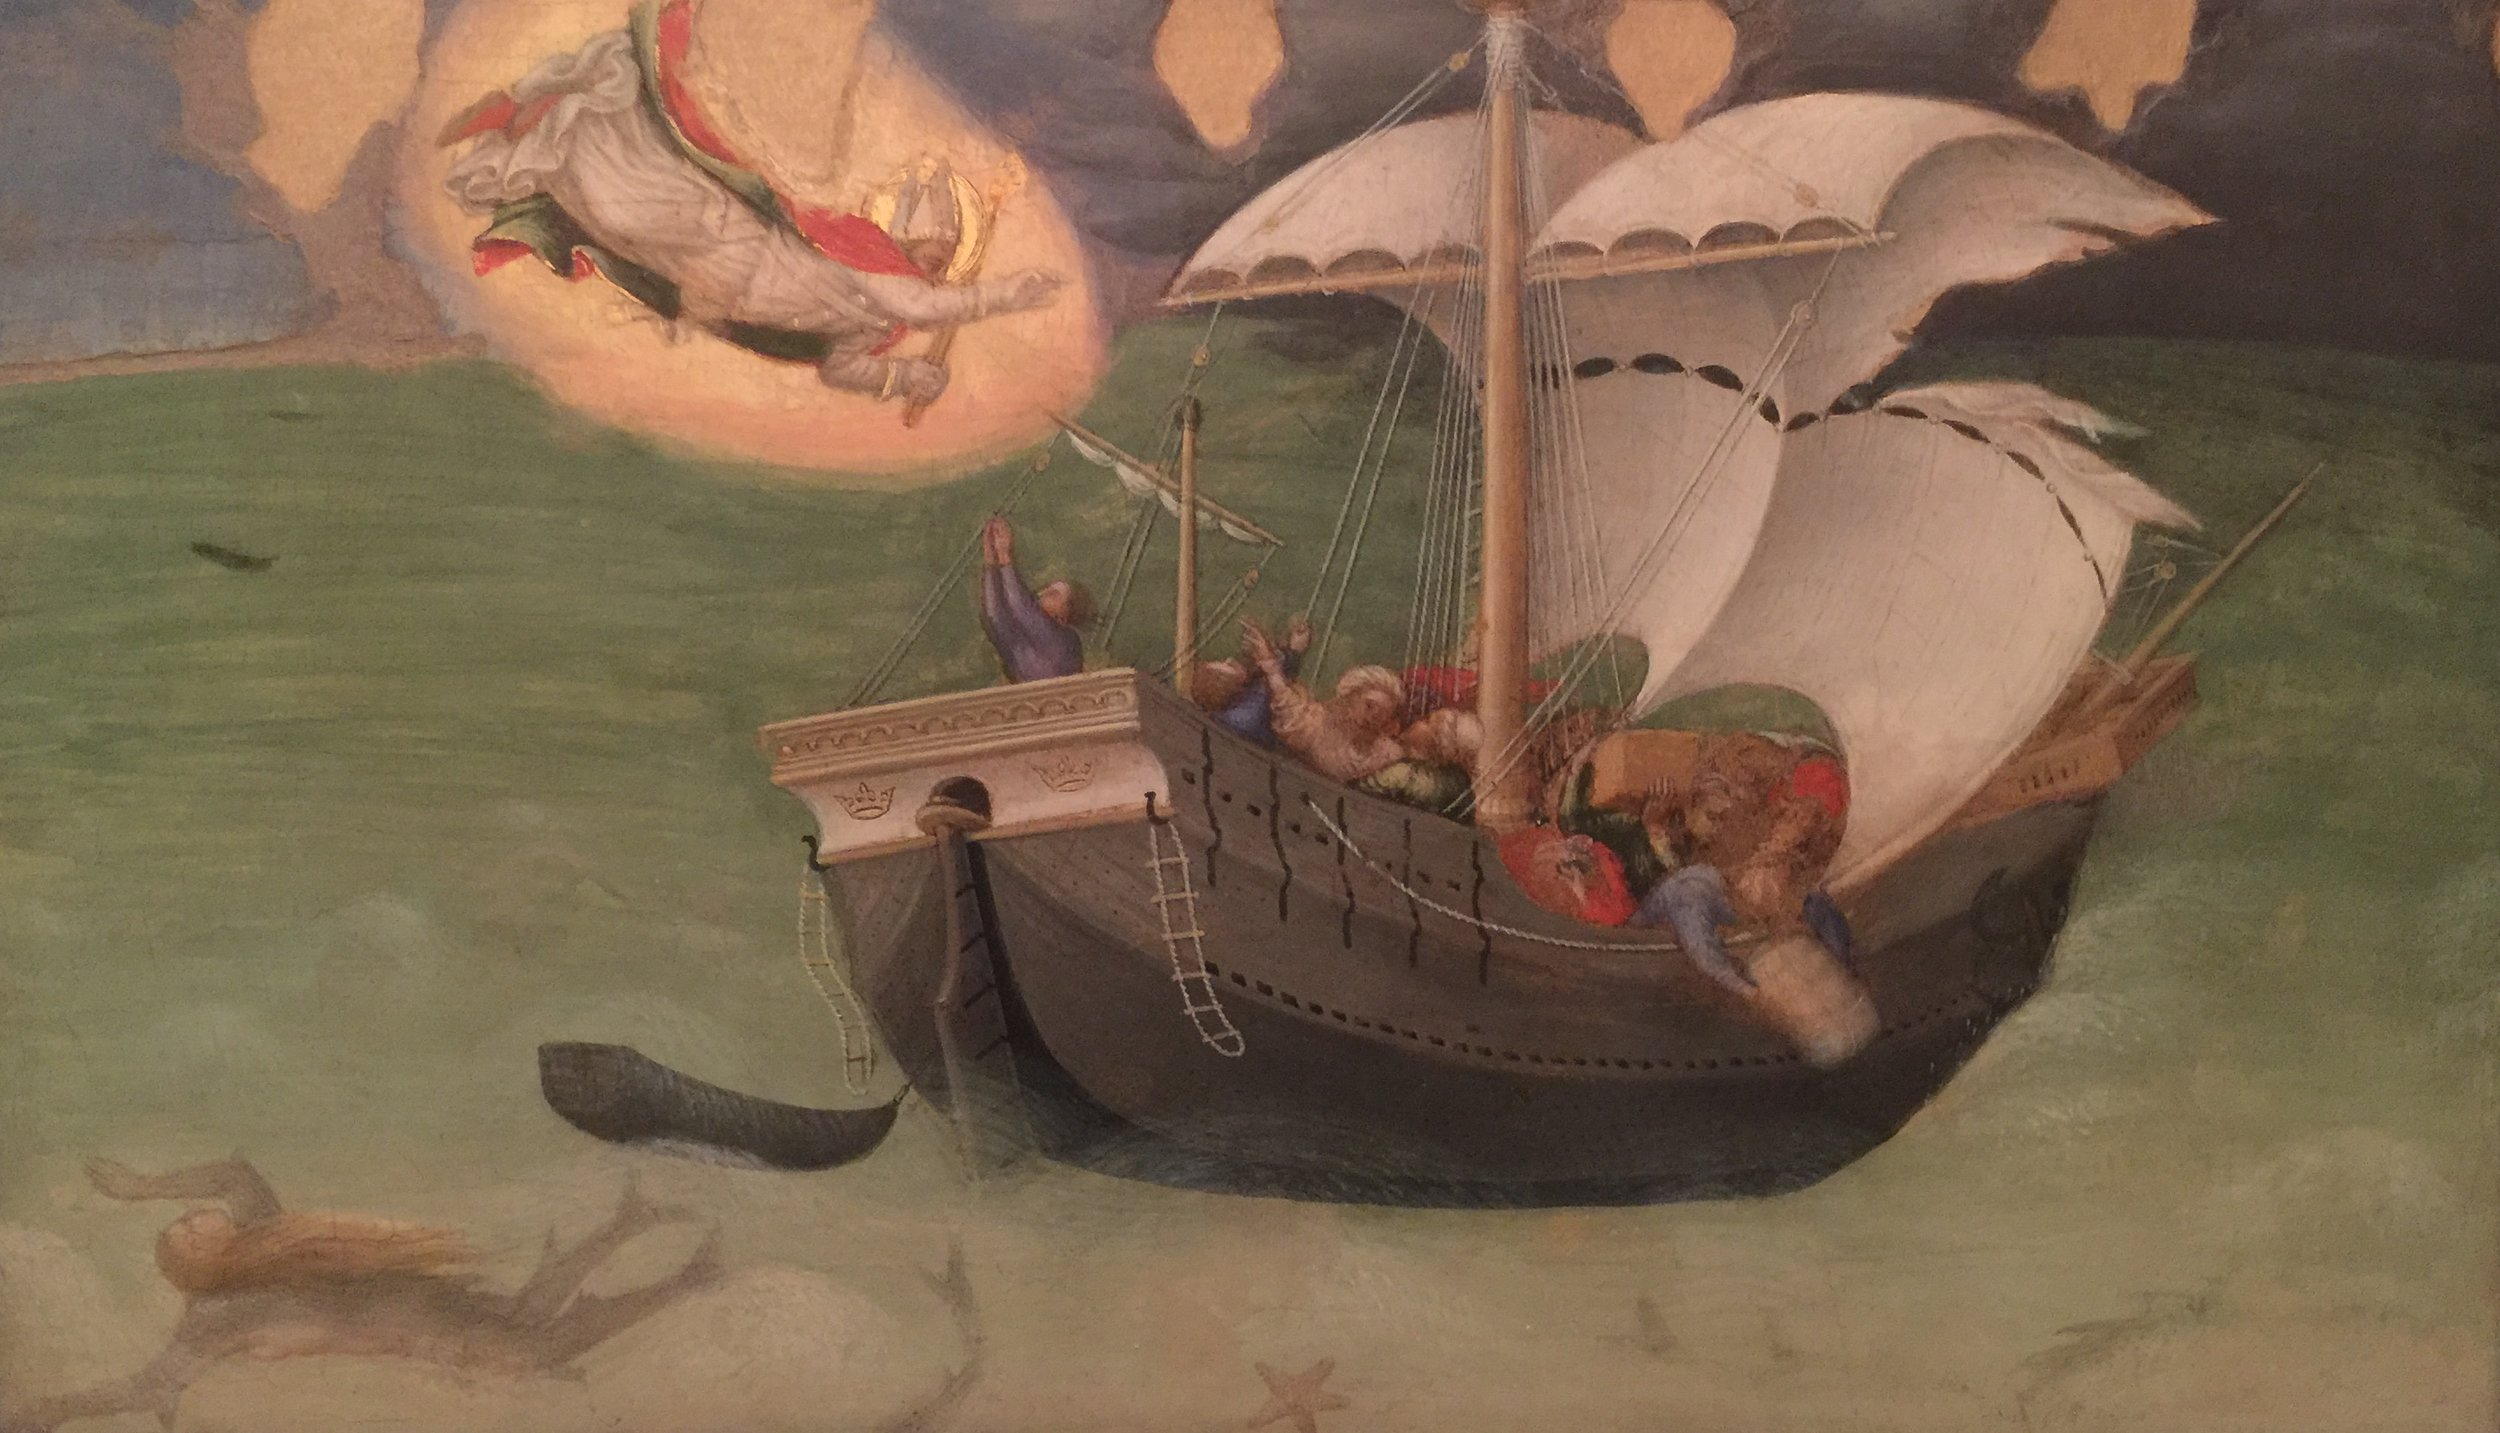 The Saint  [Nicholas of Bari]  Saves a Boat from Shipwreck , Gentile da Fabriano, 1425 (Vatican Museum, photo RYC)